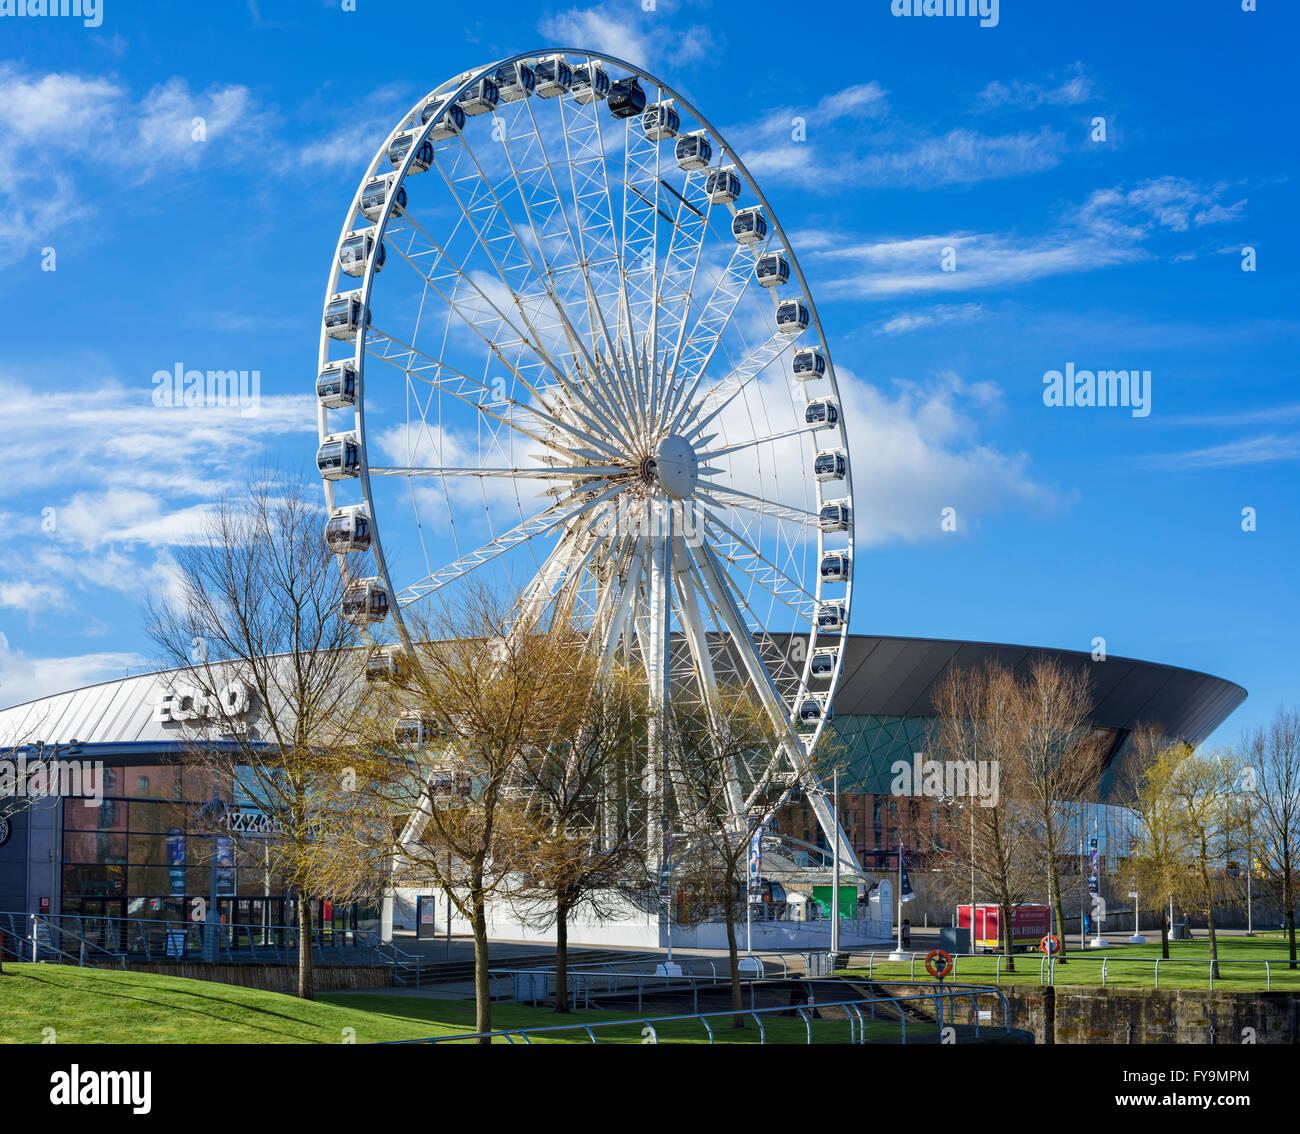 The Echo Arena and Wheel of Liverpool, Albert Dock area, Liverpool, Merseyside, England, UK - Stock Image